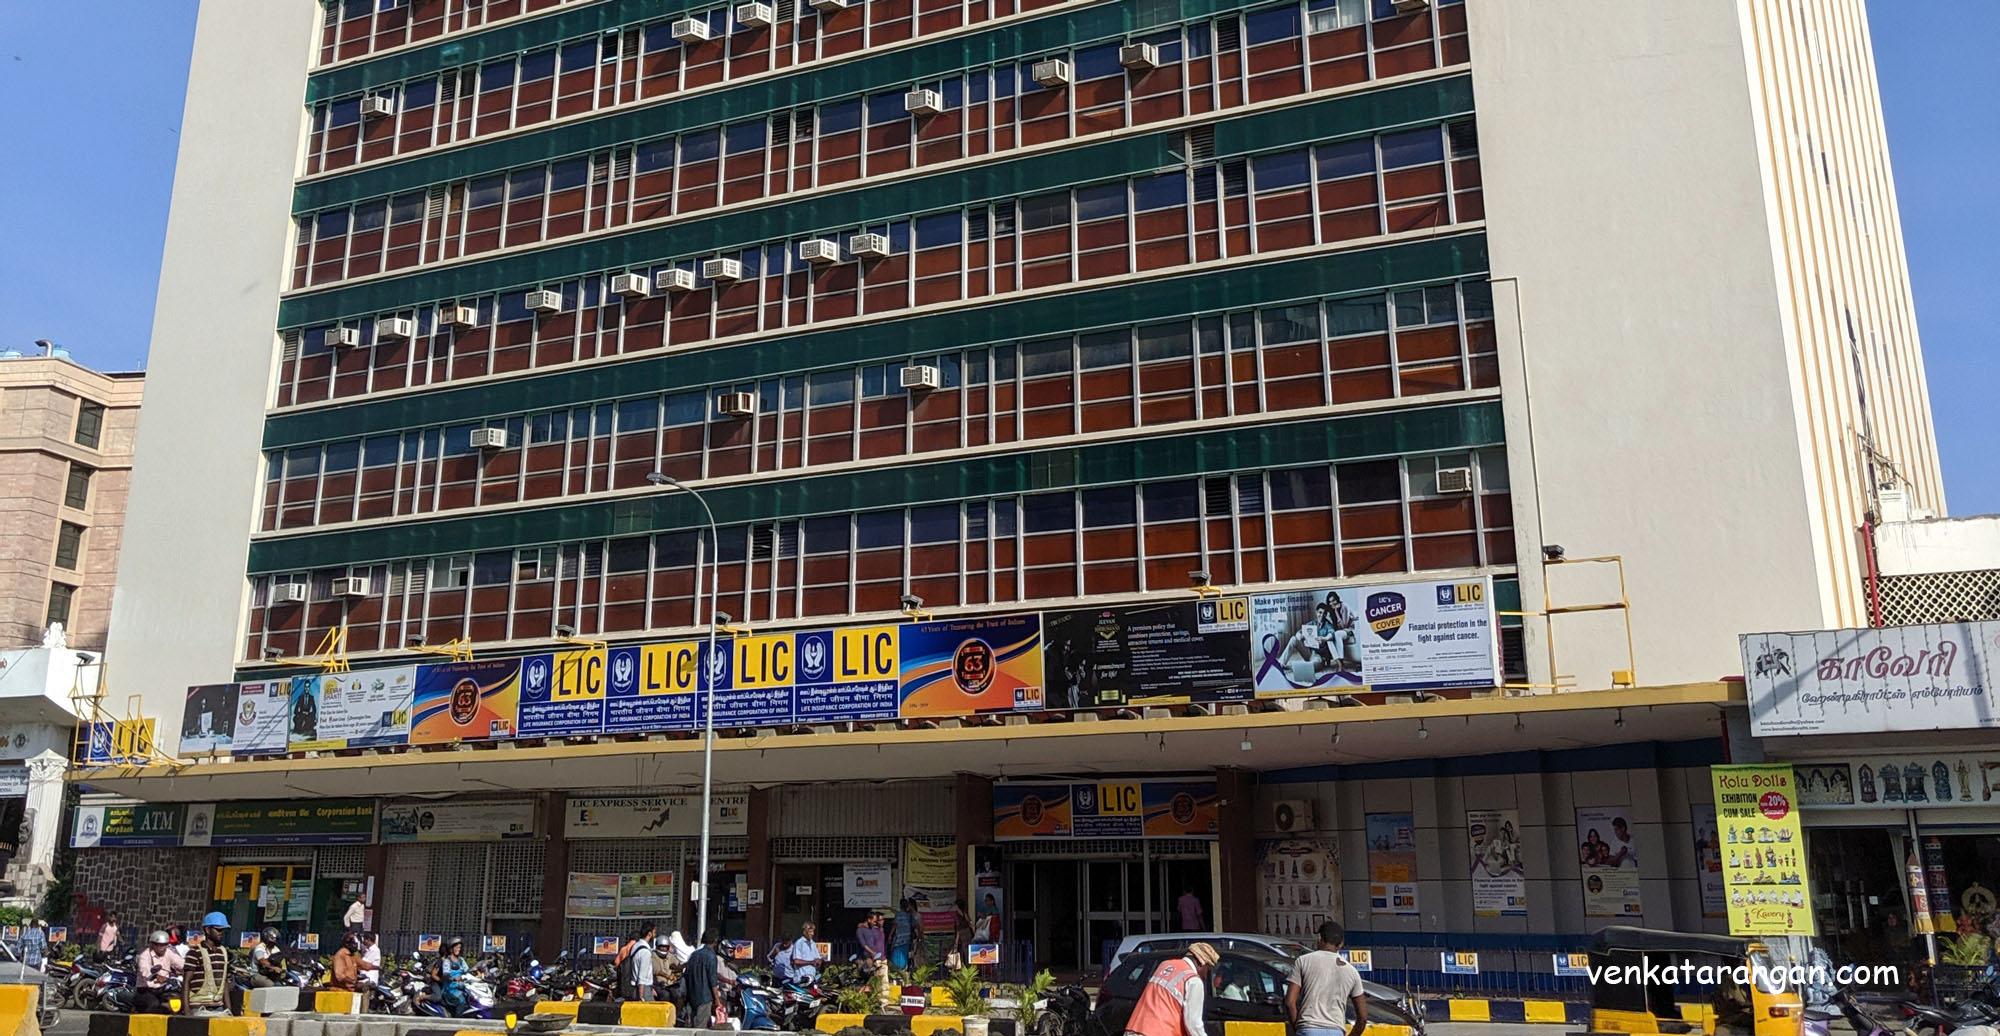 LIC Building, Chennai, Seen as on September 019